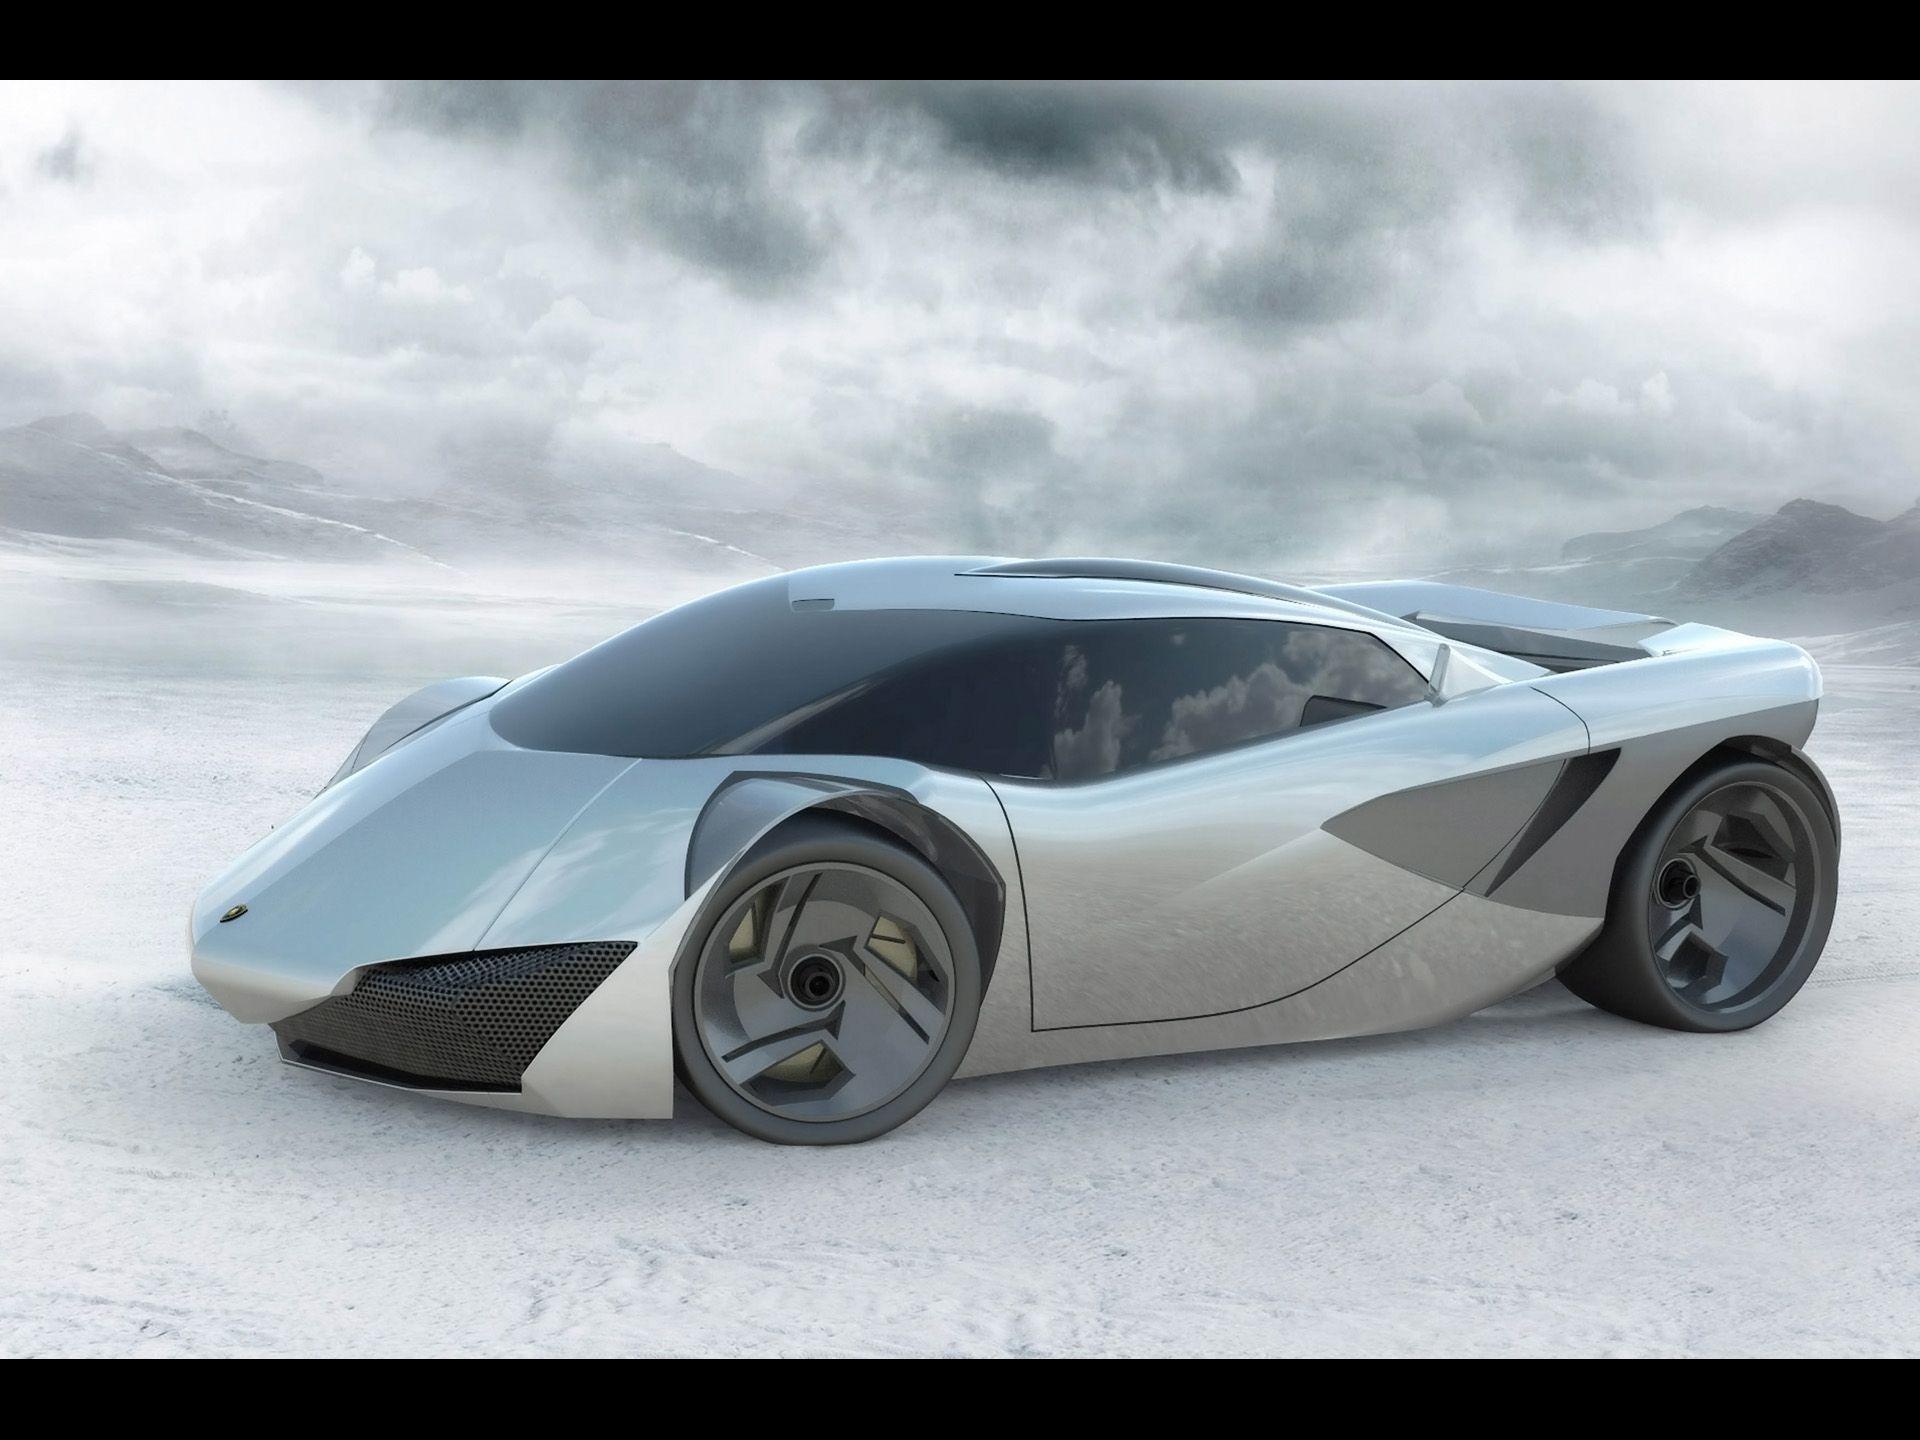 Lamborghini minotauro concept design 2010 wallpaper wallpapers http www hdcarwallpapers in